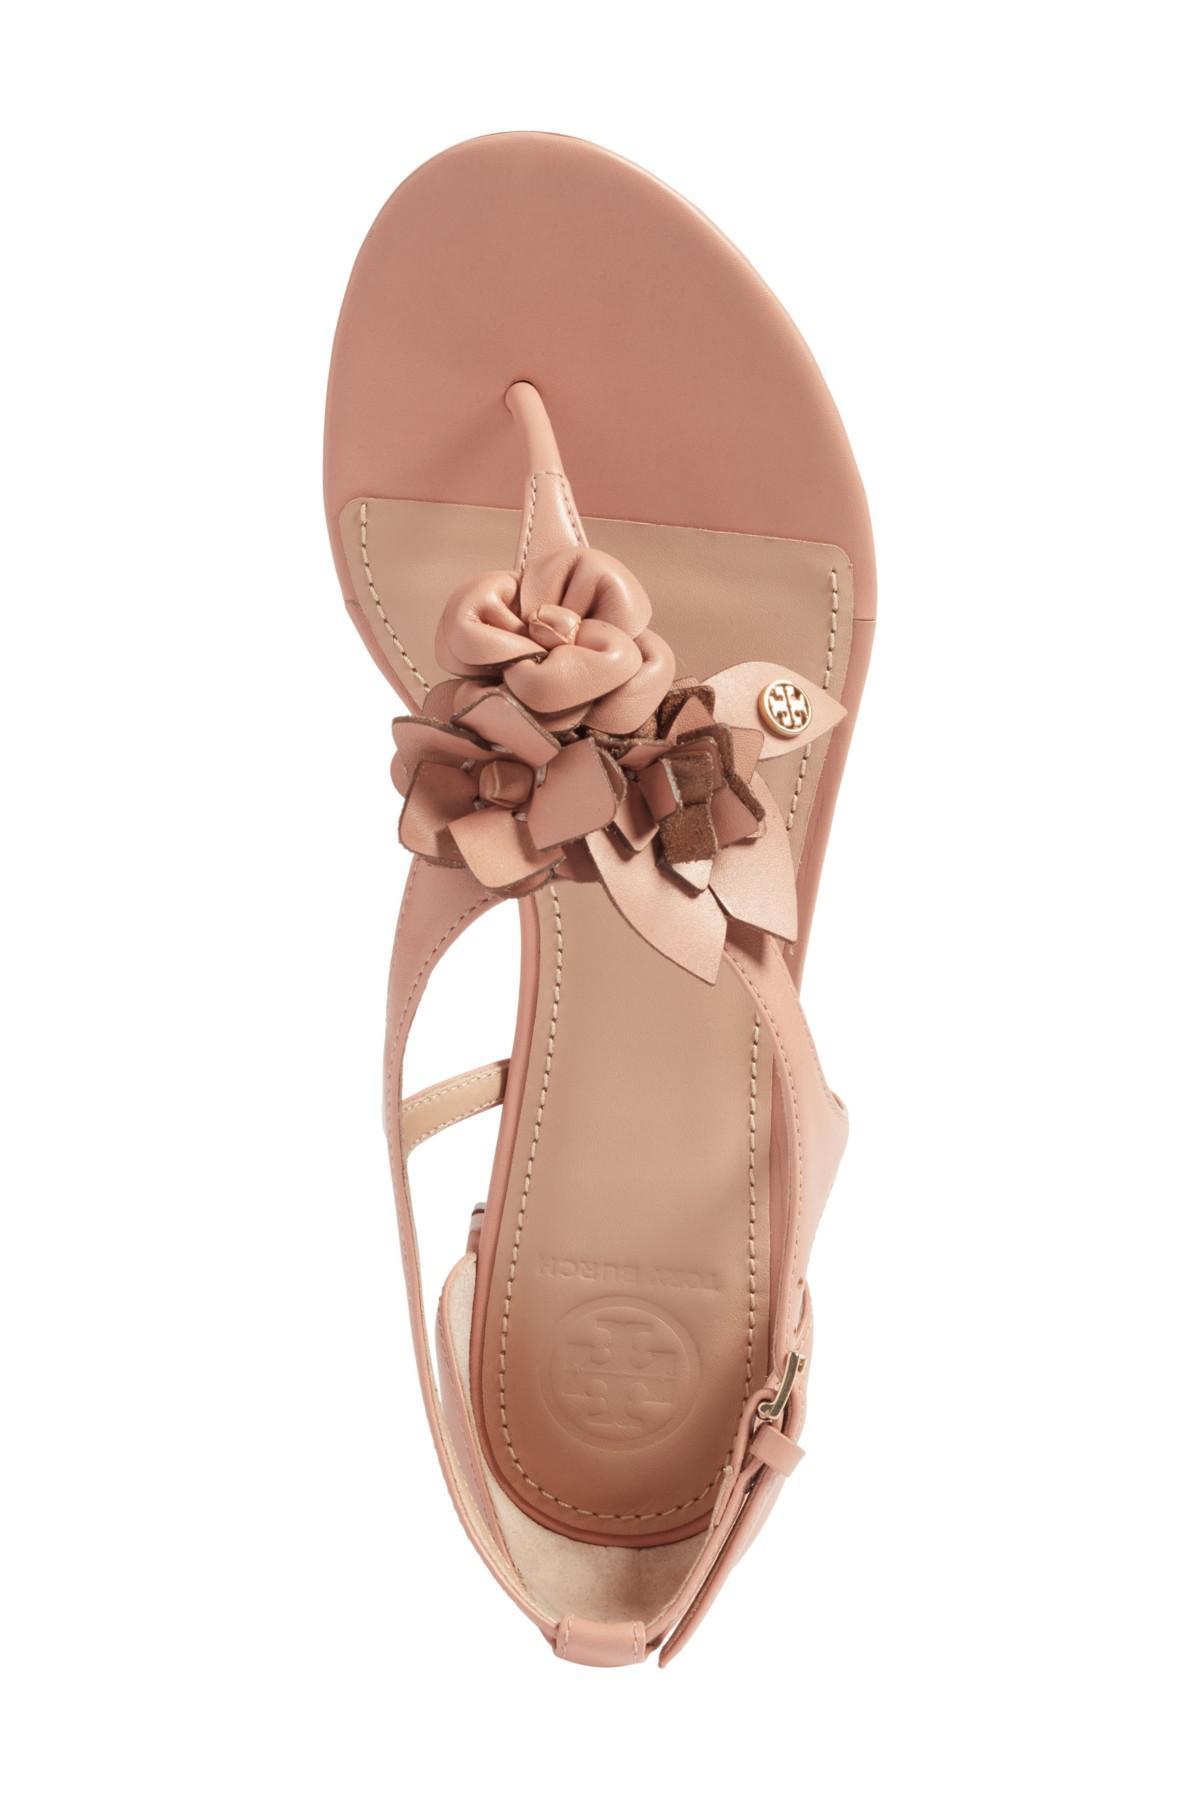 632ef6c7b953b2 Lyst - Tory Burch Blossom Sandal